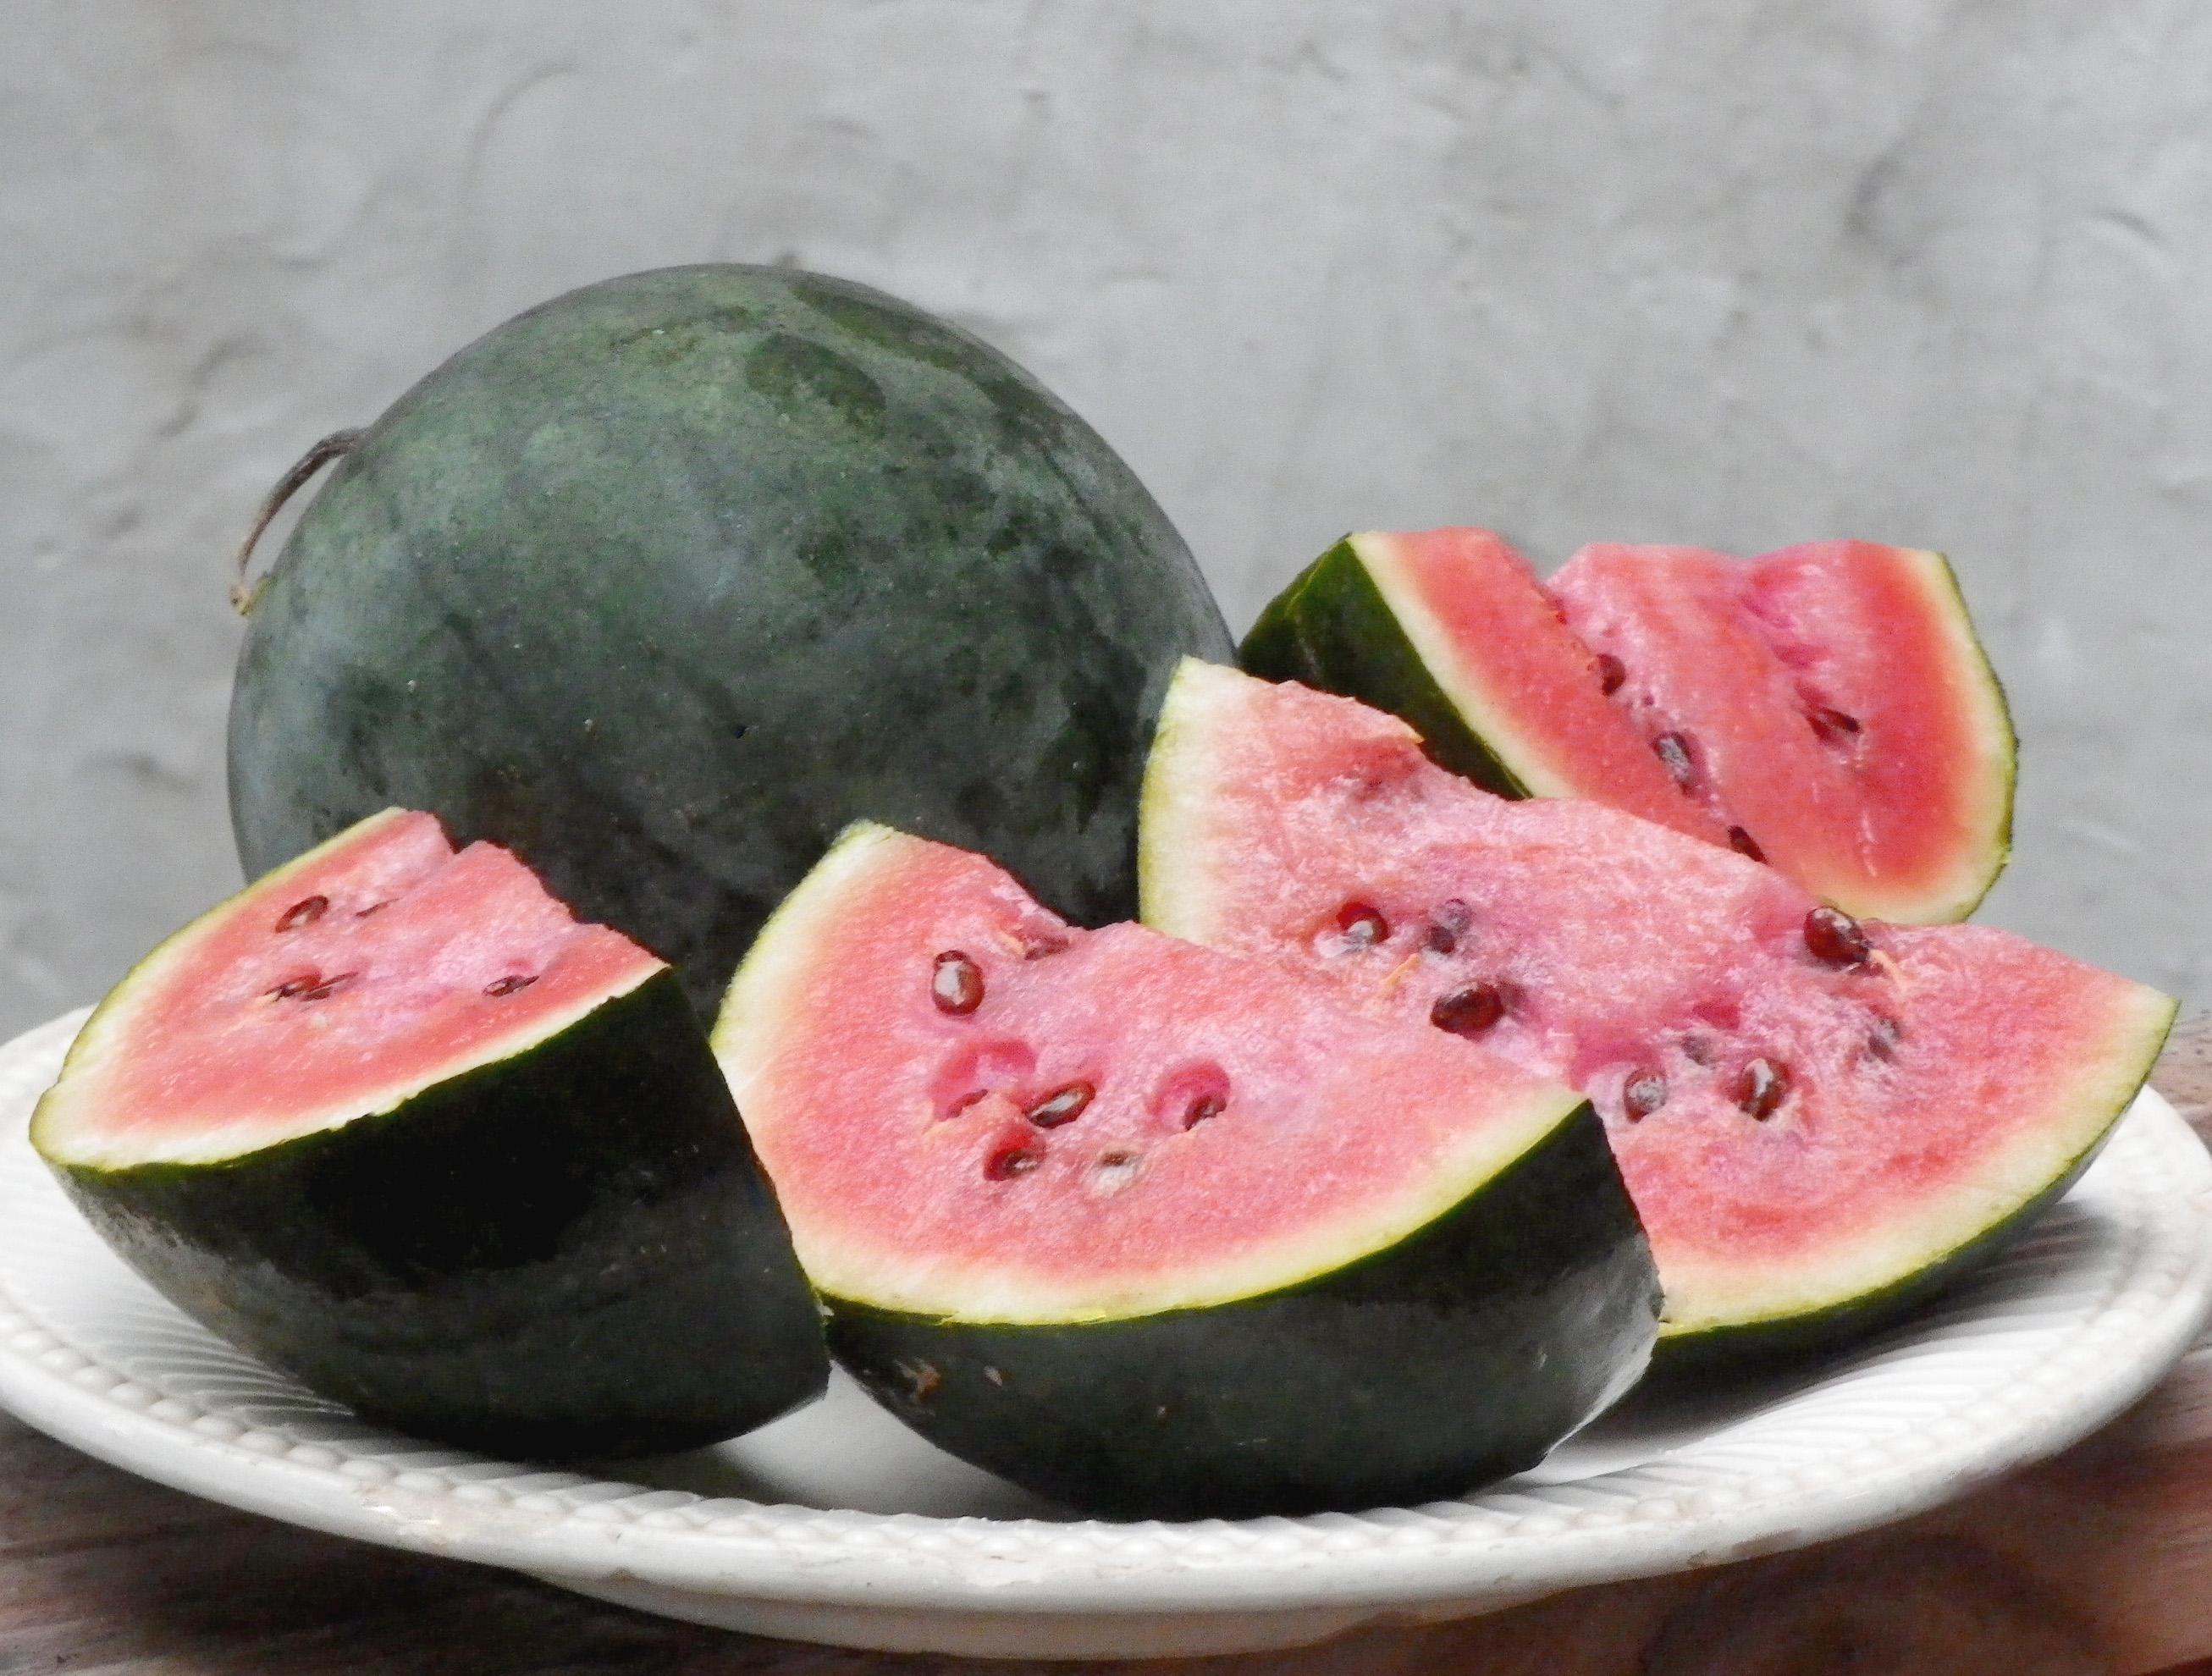 Sugar Baby Watermelon 2 G Click To Enlarge